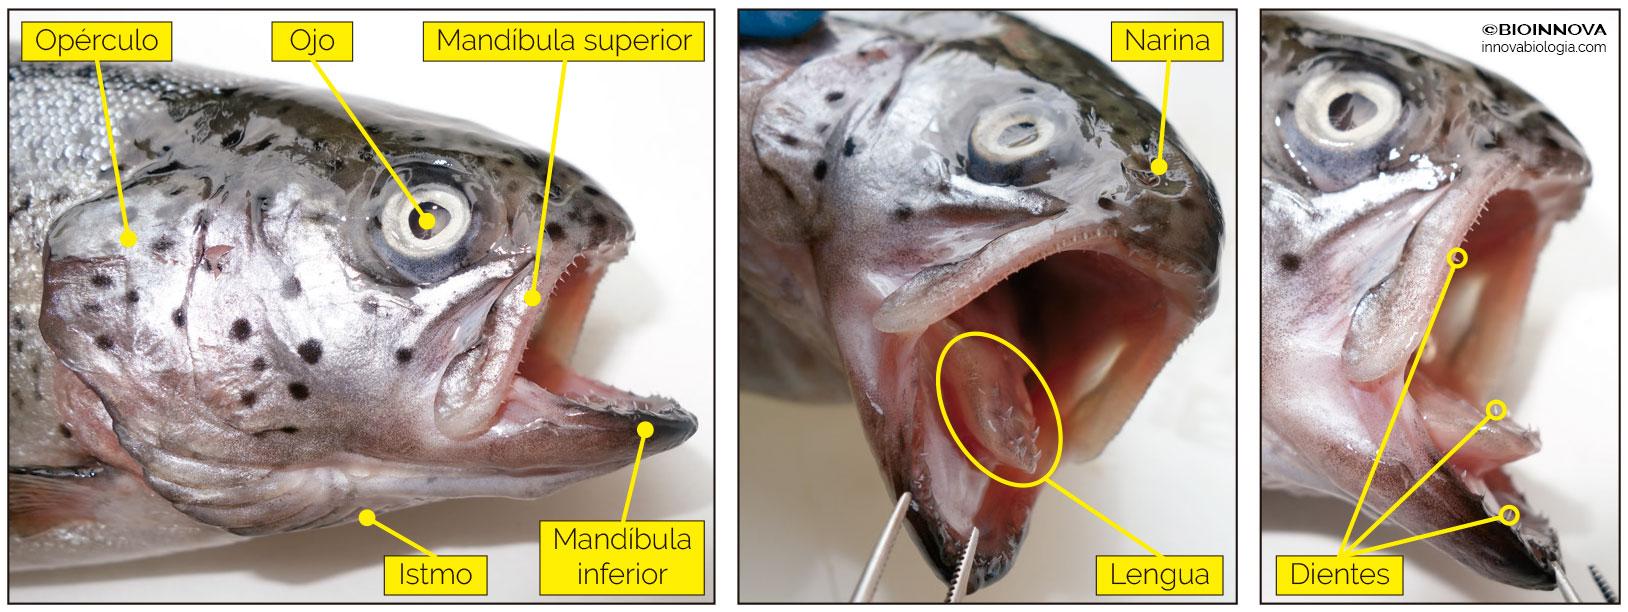 Anatomía de un vertebrado :: Trucha arcoíris – BIOINNOVA